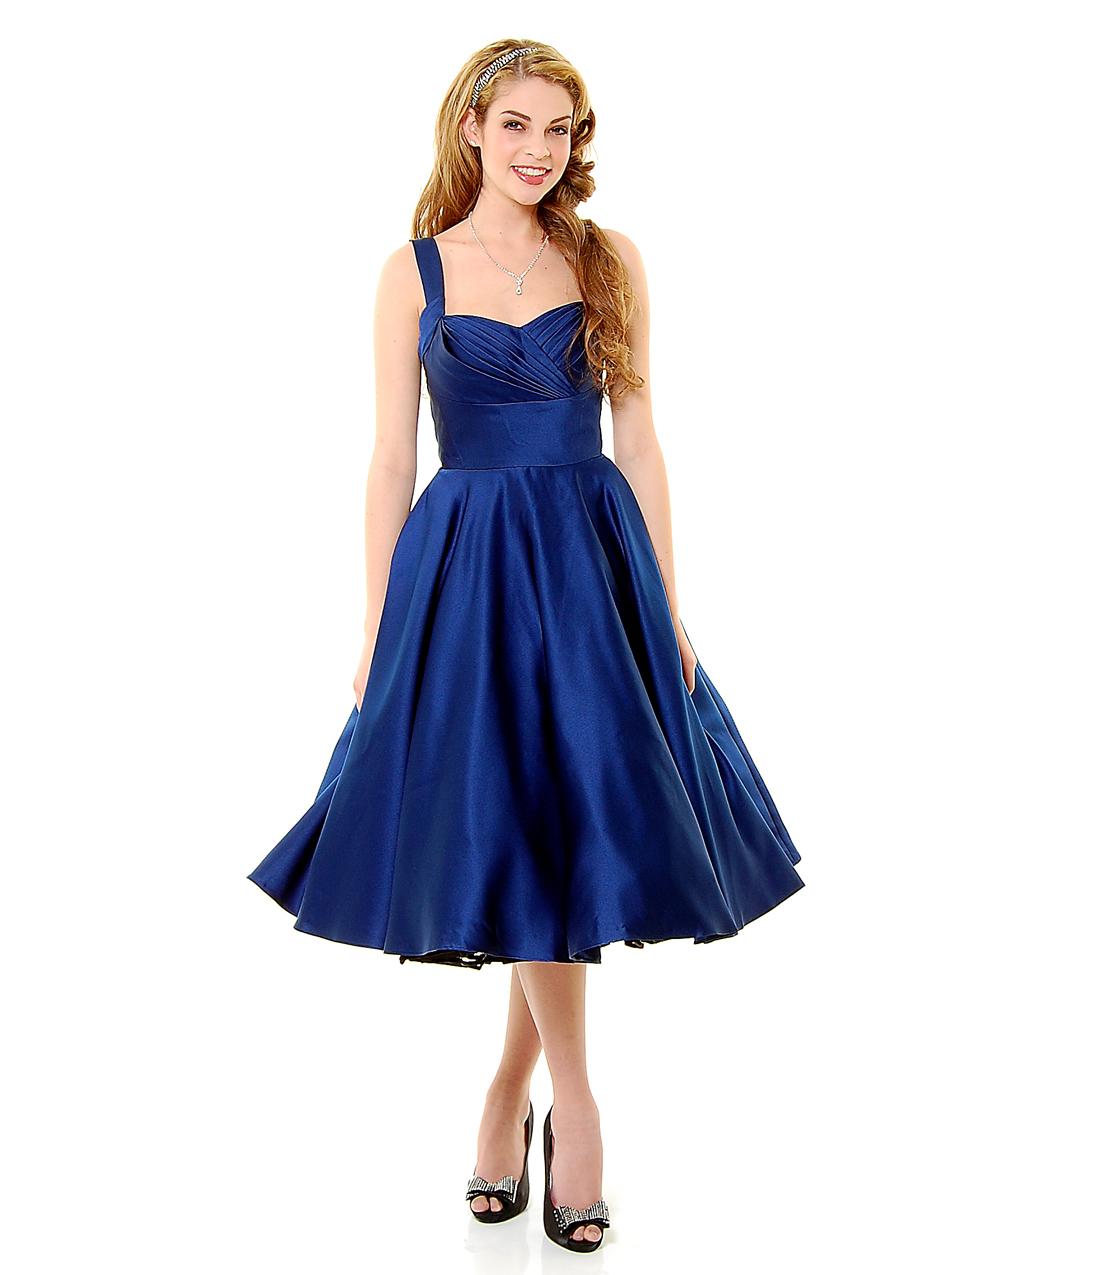 Swing Dress Dressed Up Girl